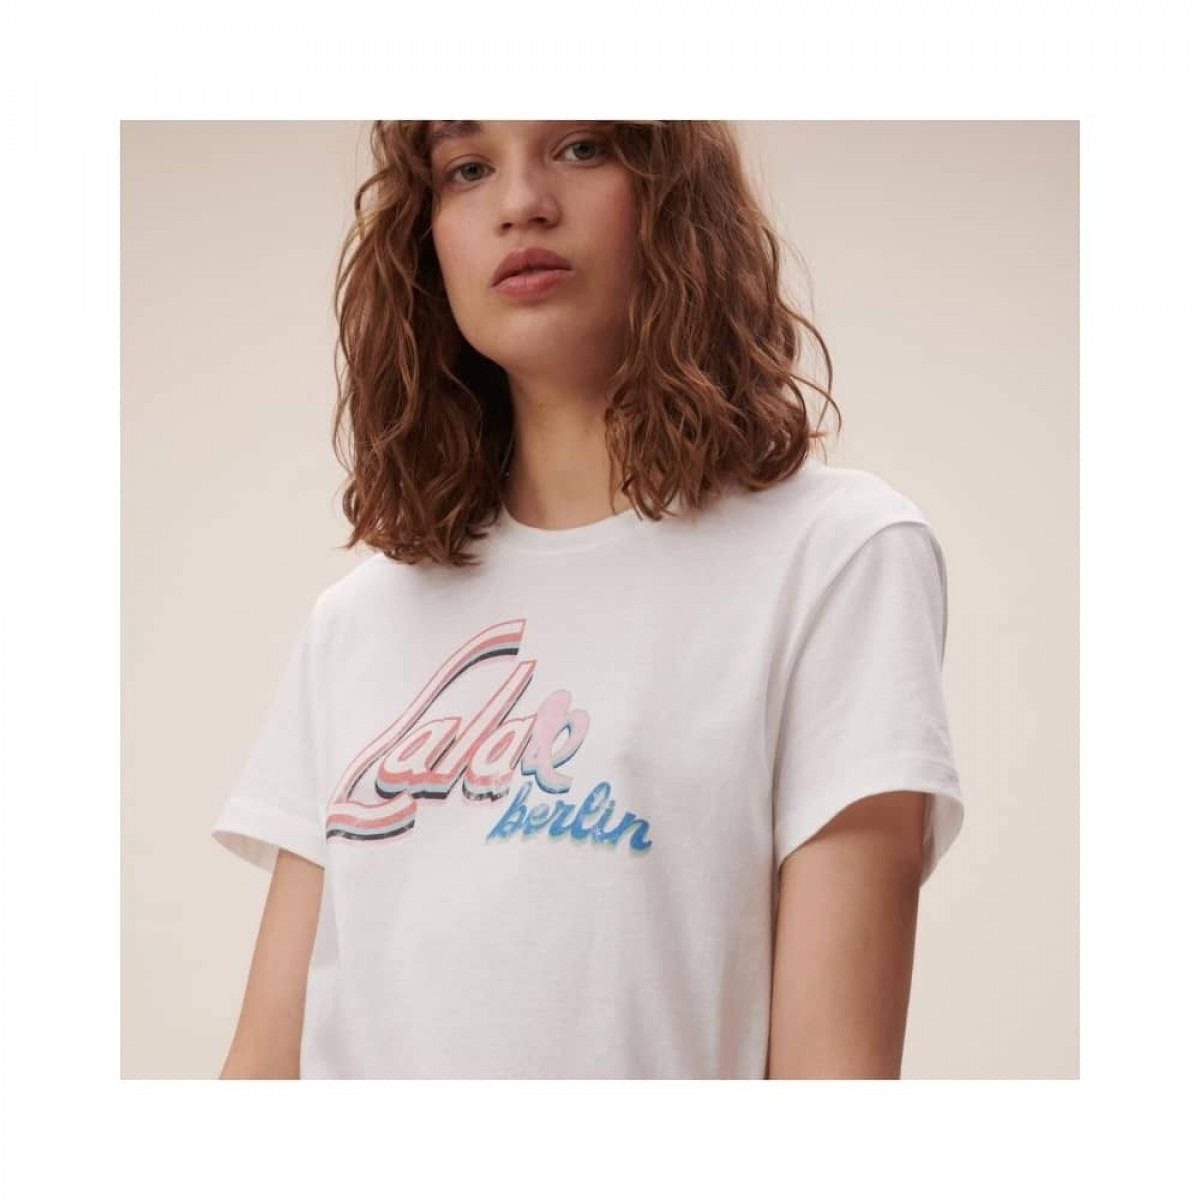 cara t-shirt - white